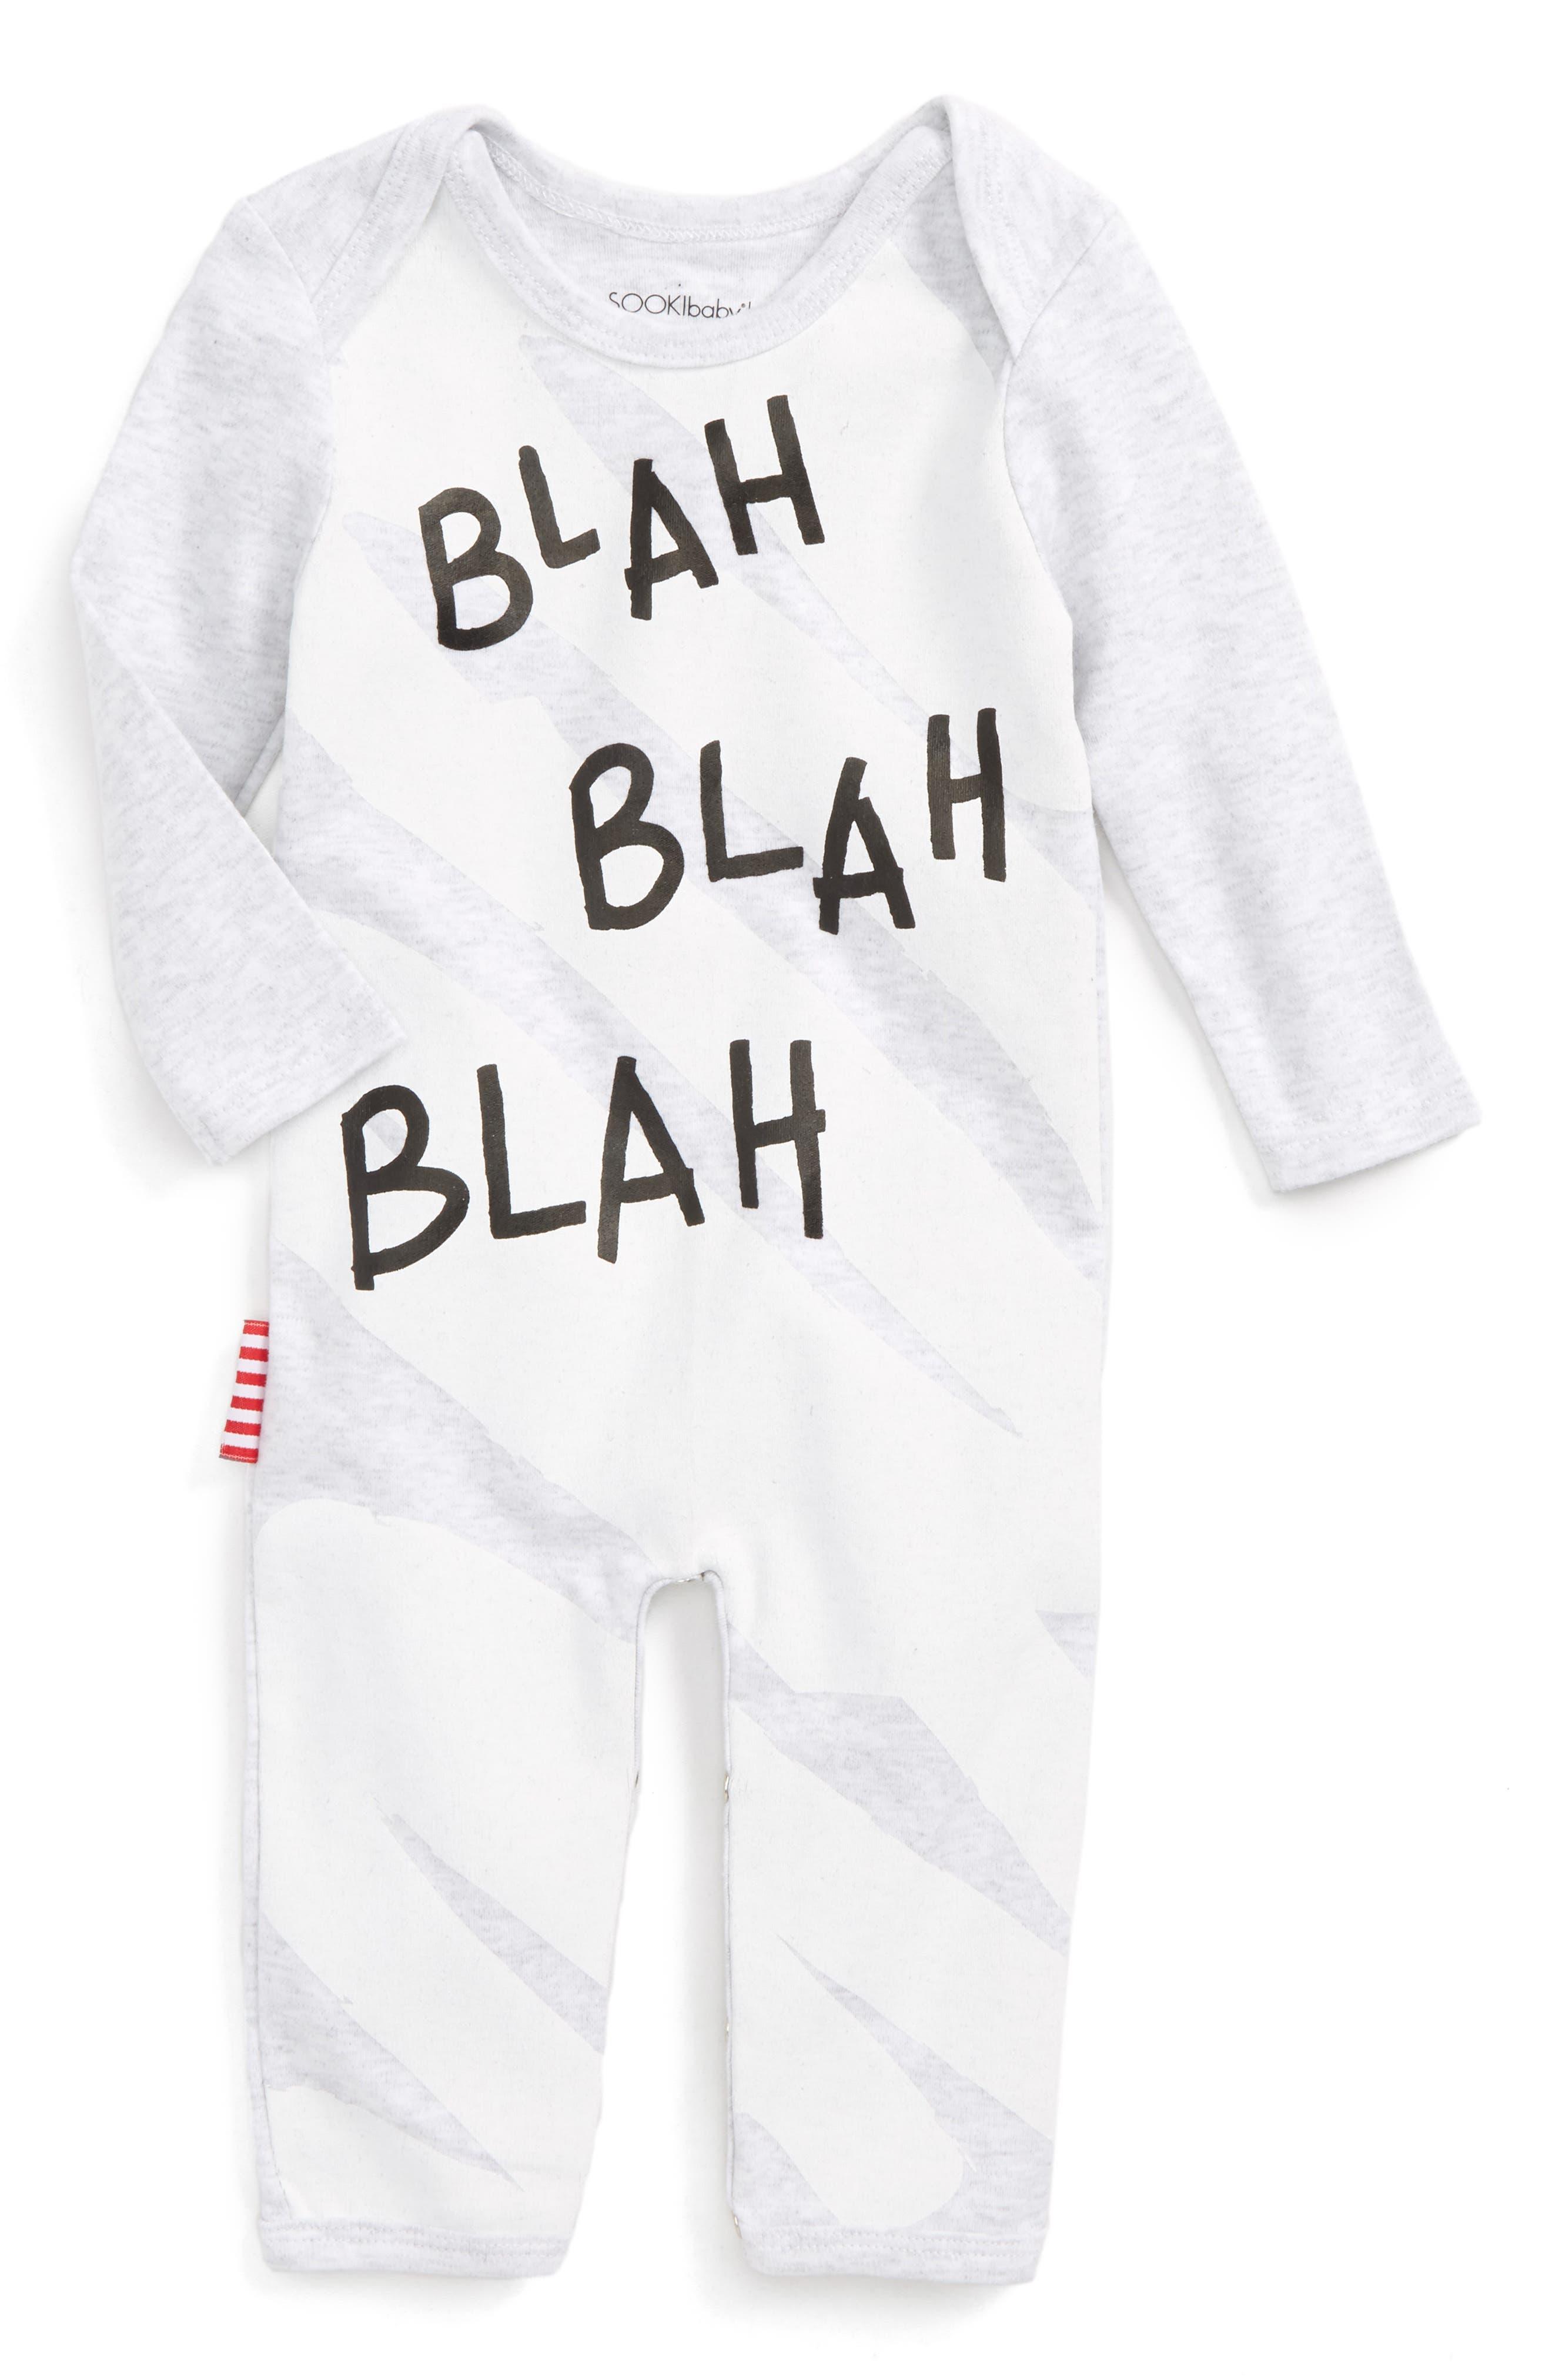 Main Image - SOOKIbaby Blah Blah Blah Romper (Baby)